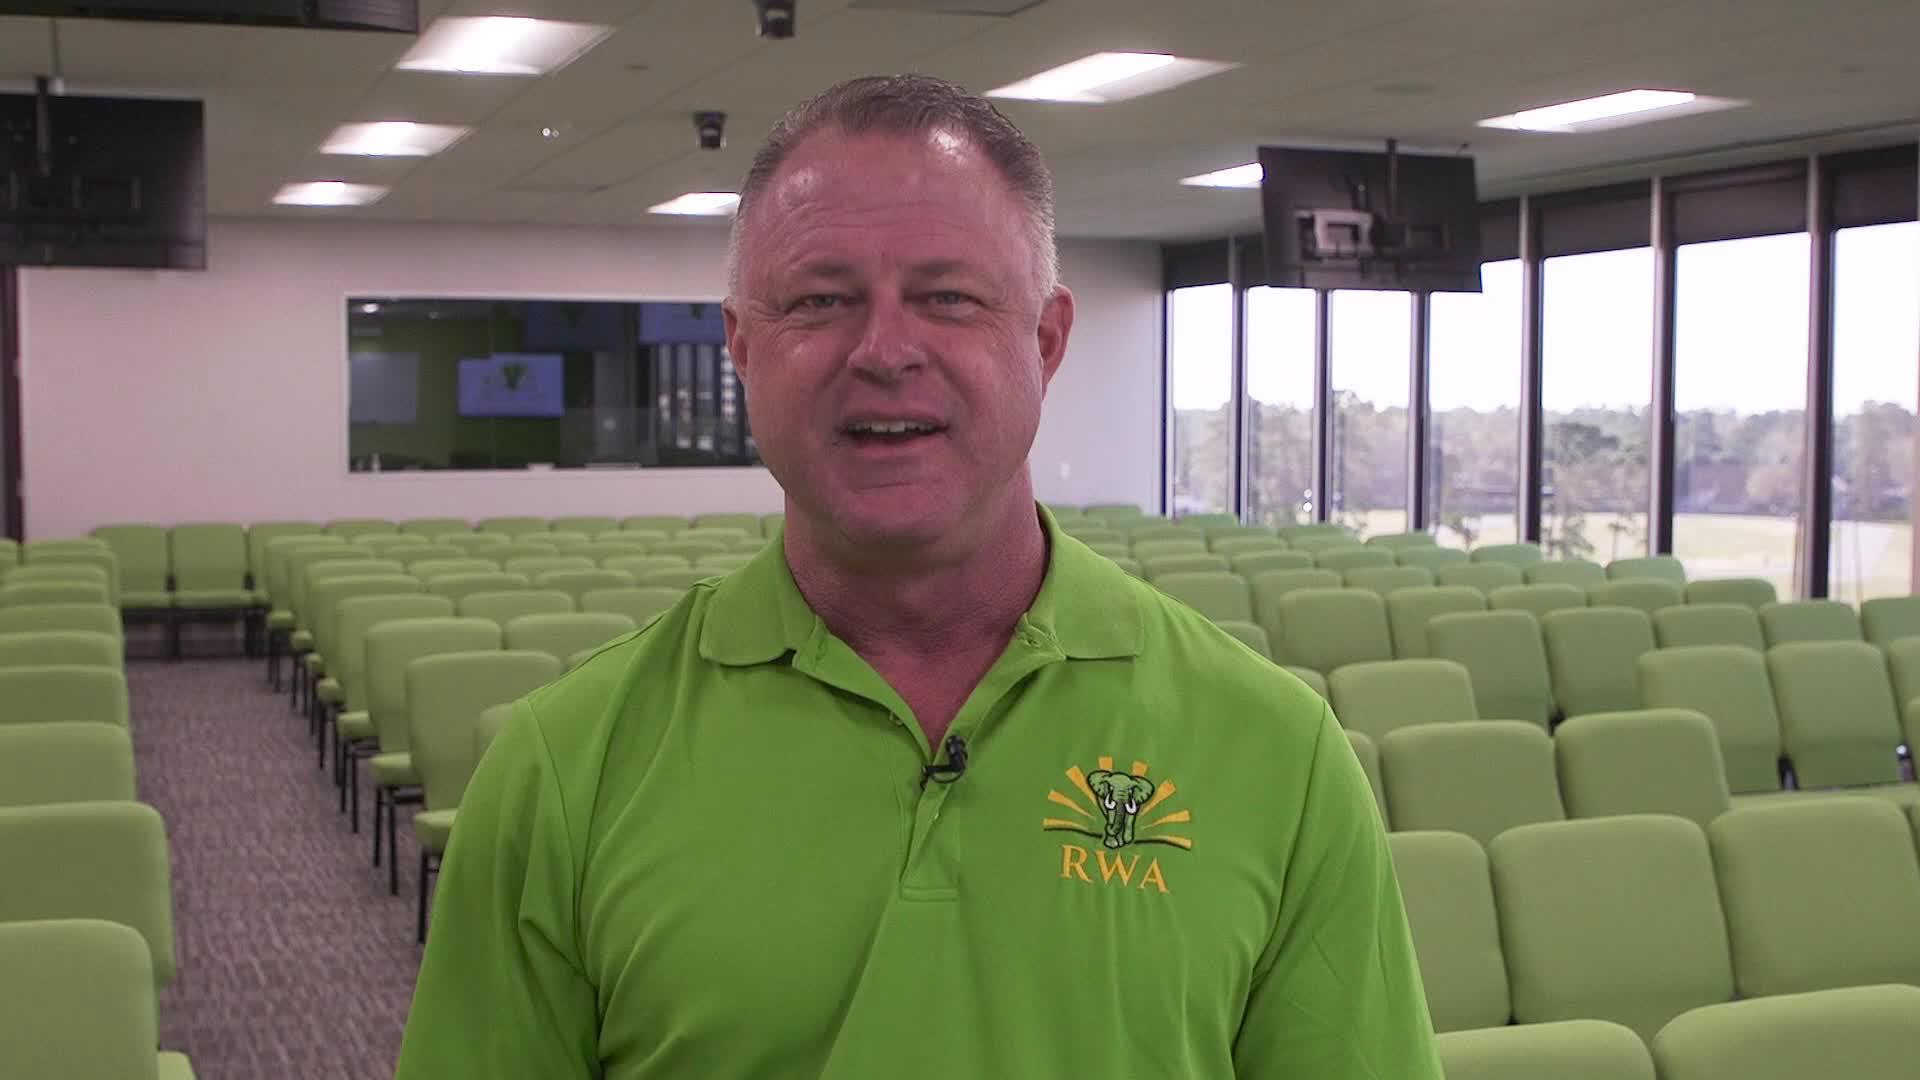 Steve Davis from Real Wealth Academy - Testimonial